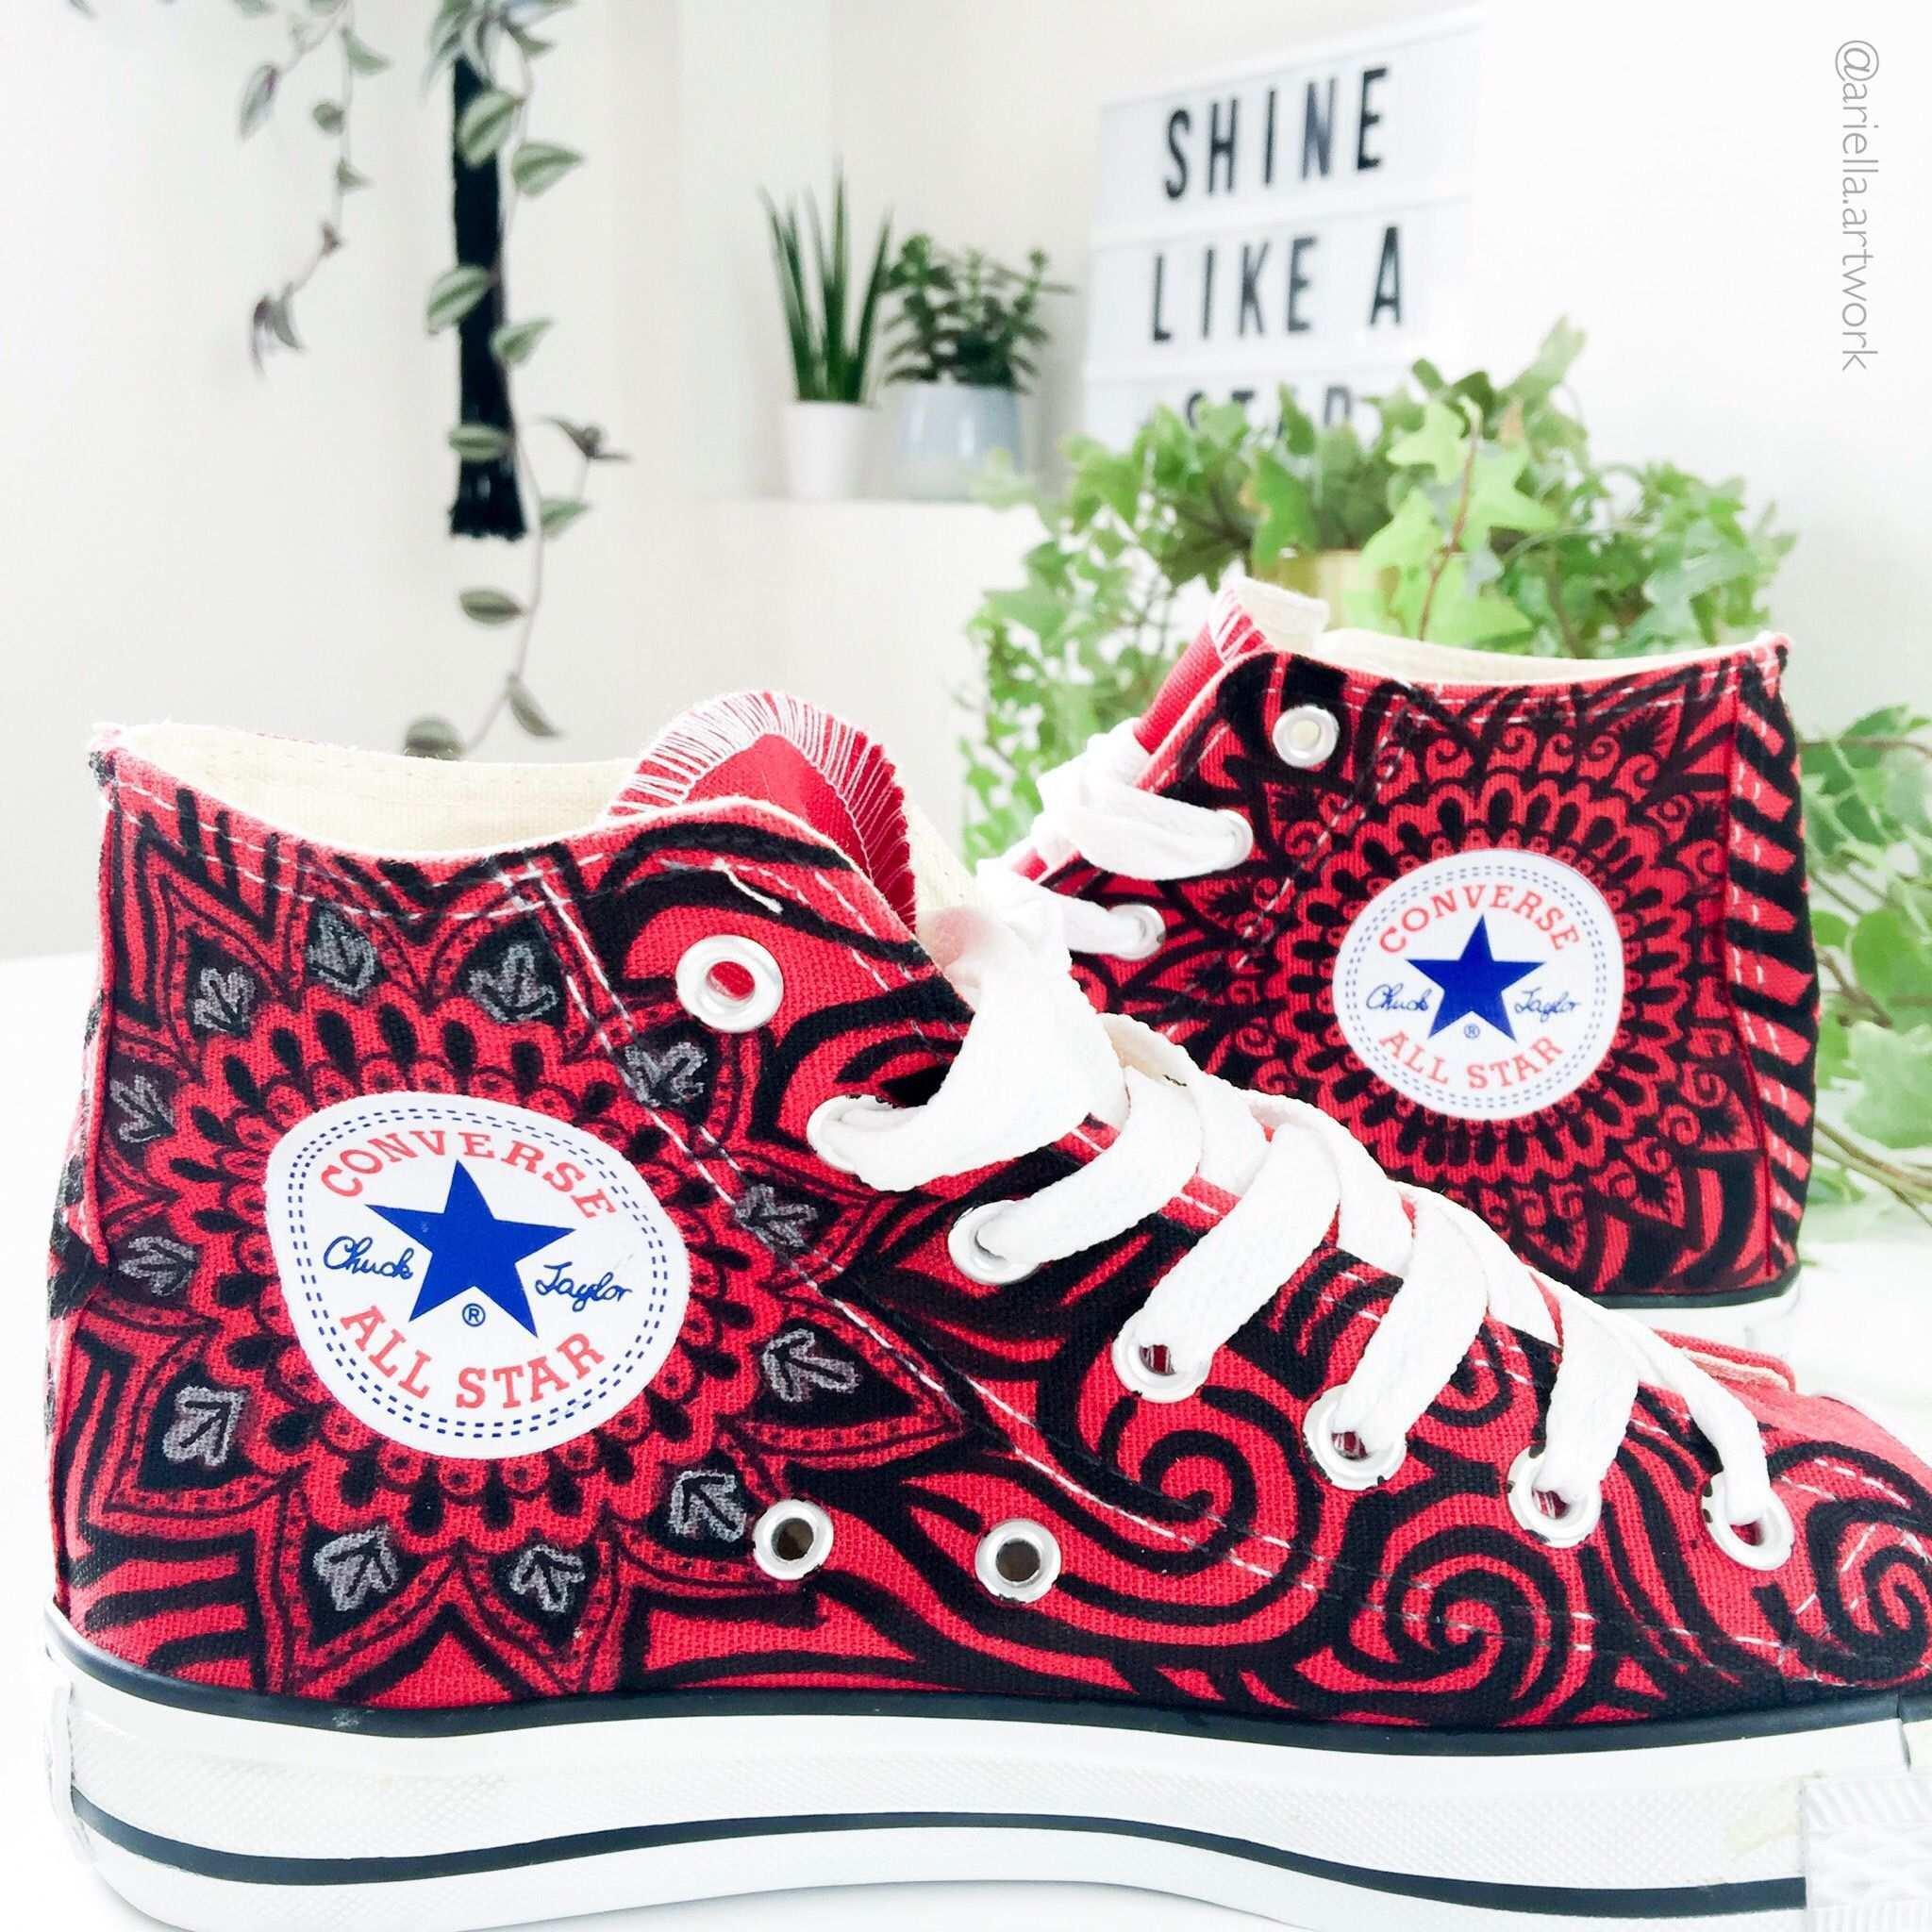 Chucks Converse Handbemalt Mit Mandala Und Zentangle Muster Posca Handmade Tattoo Zentangle Muster Converse